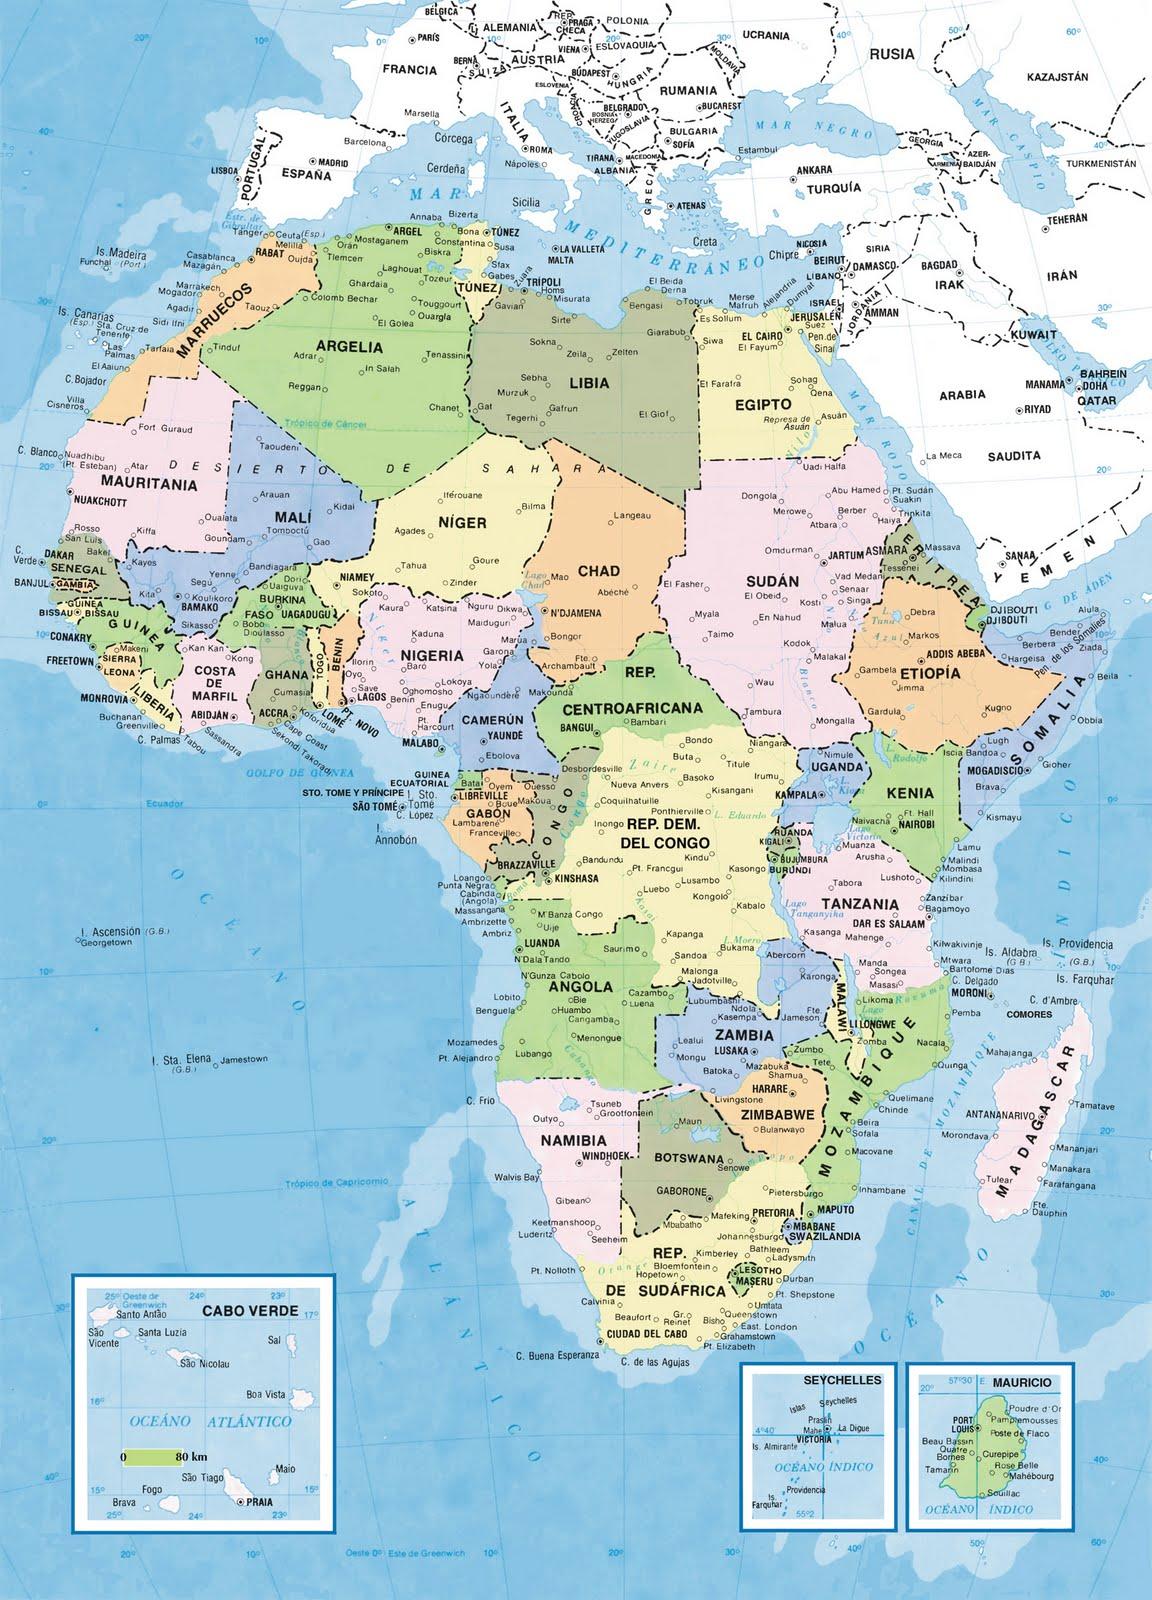 Mapas de África: mapas políticos, mapas en blanco, mapas curiosos